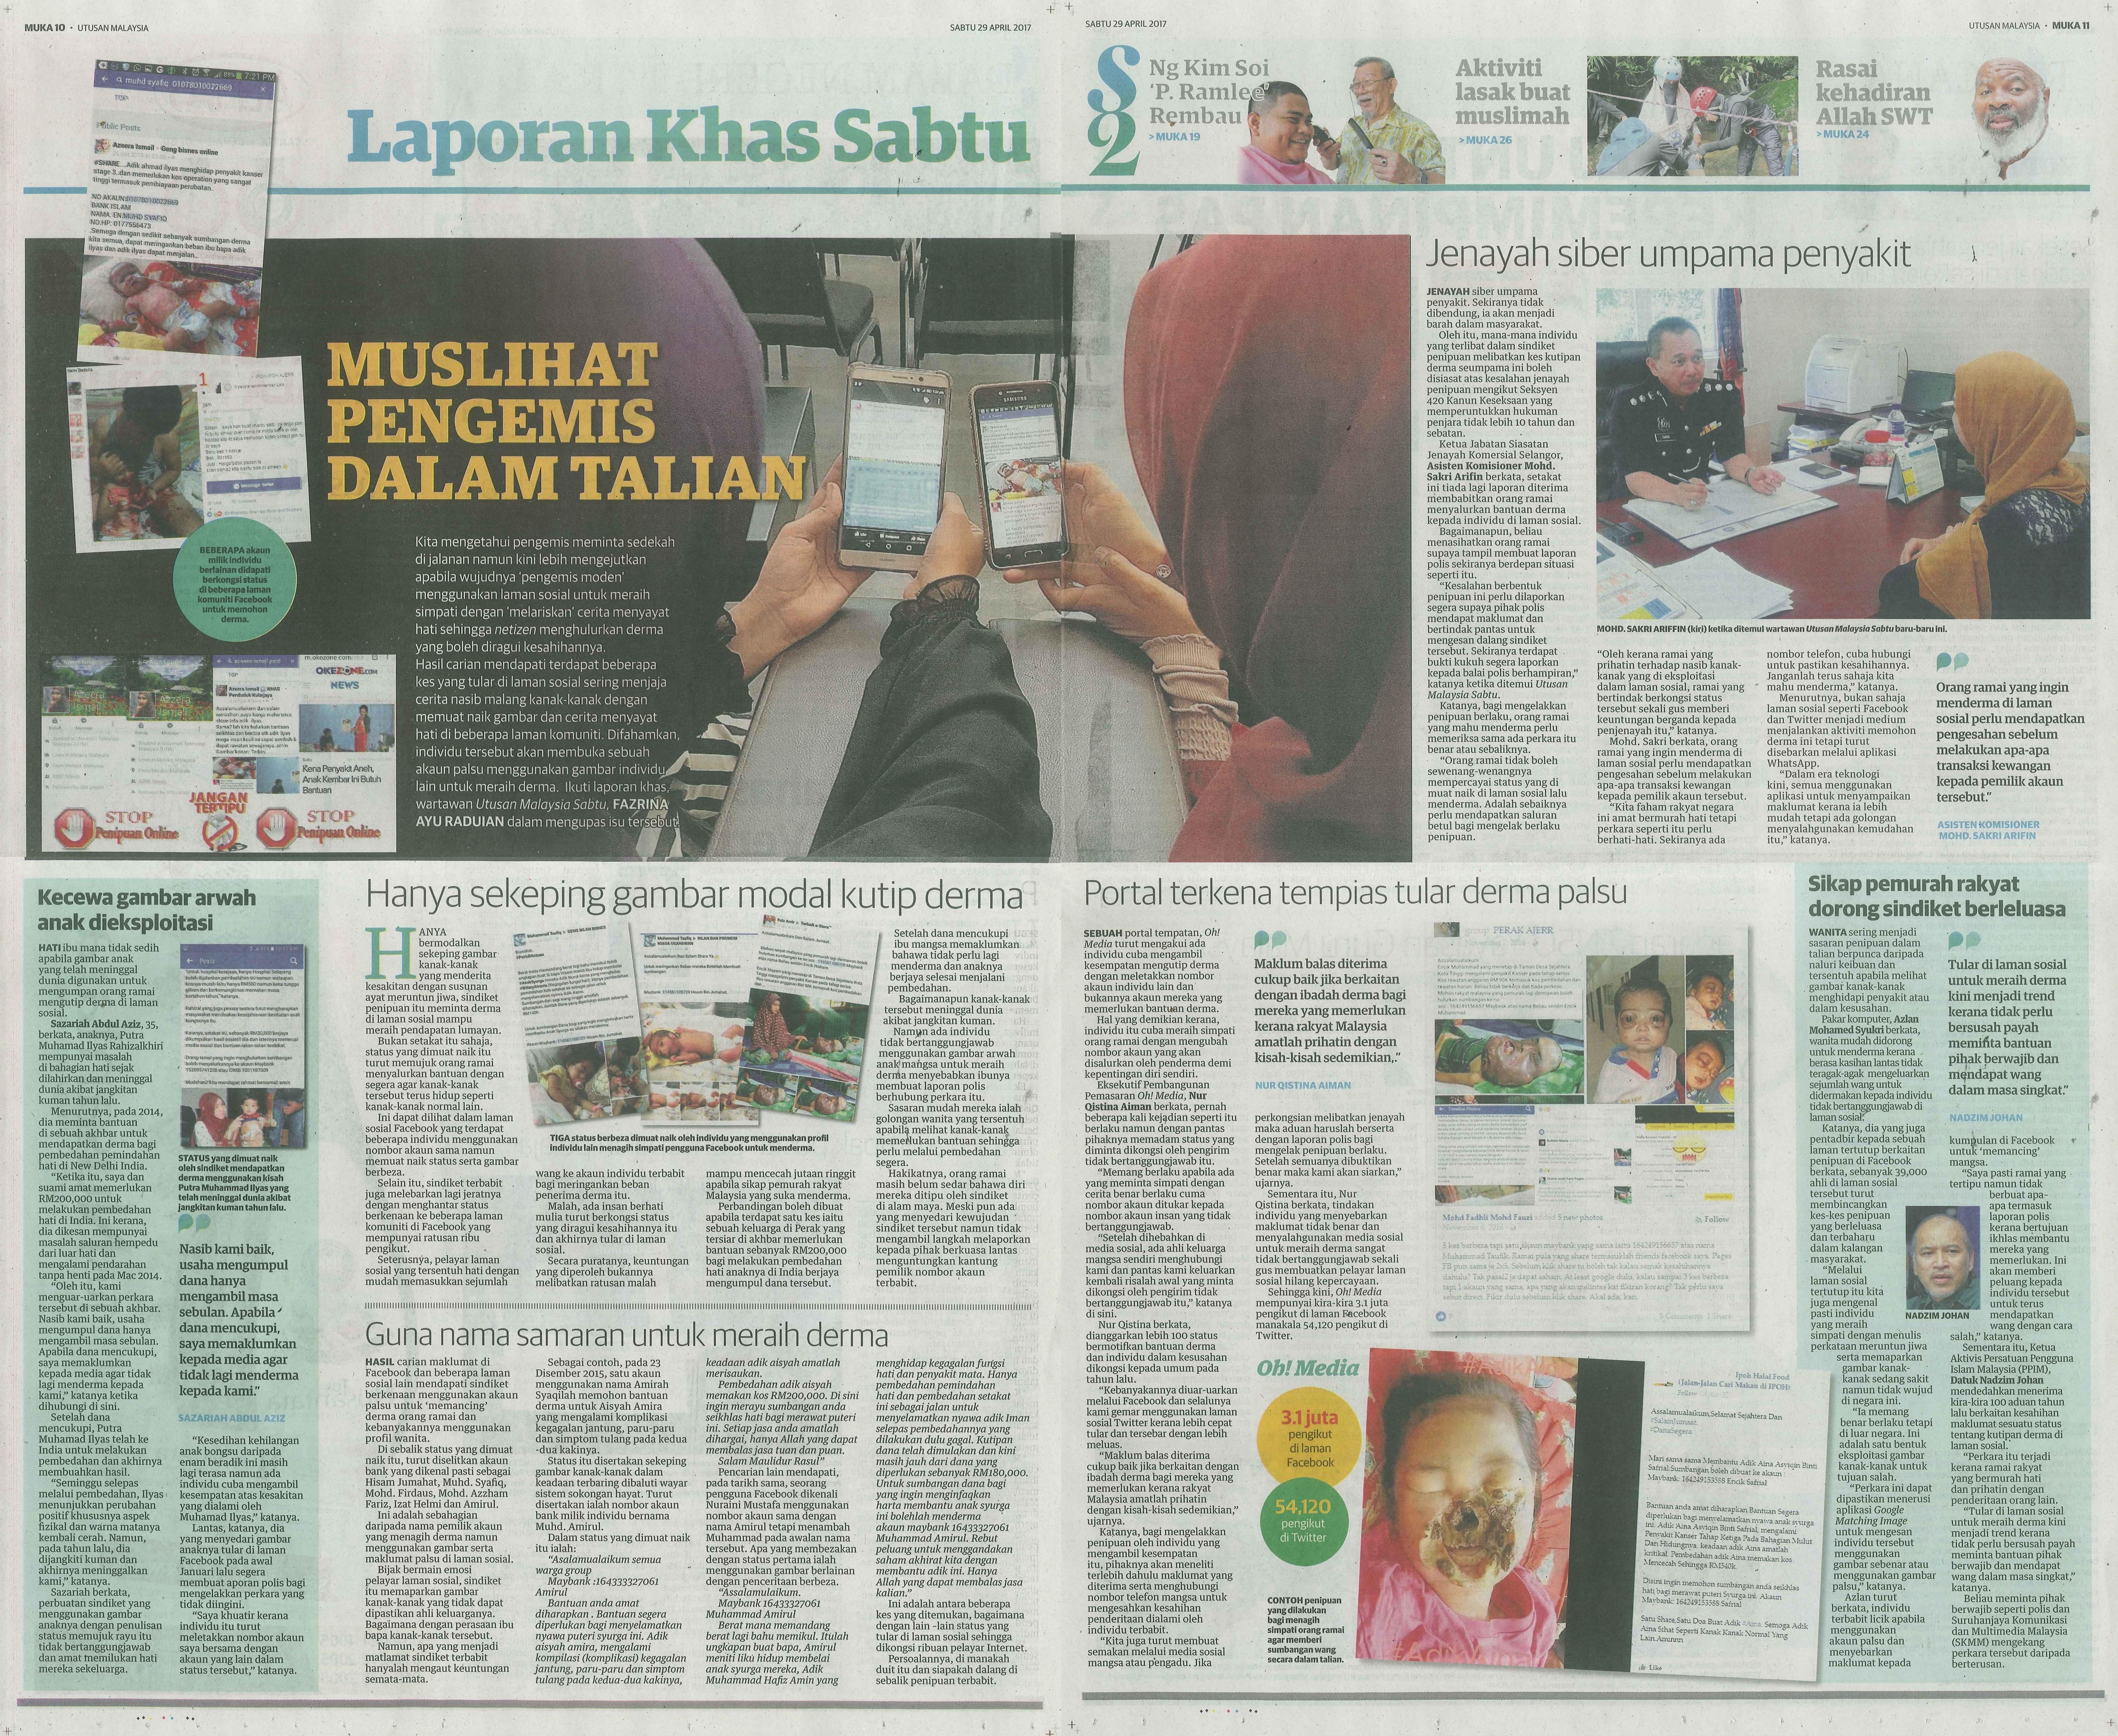 utusan malaysia 29.4.2017 3